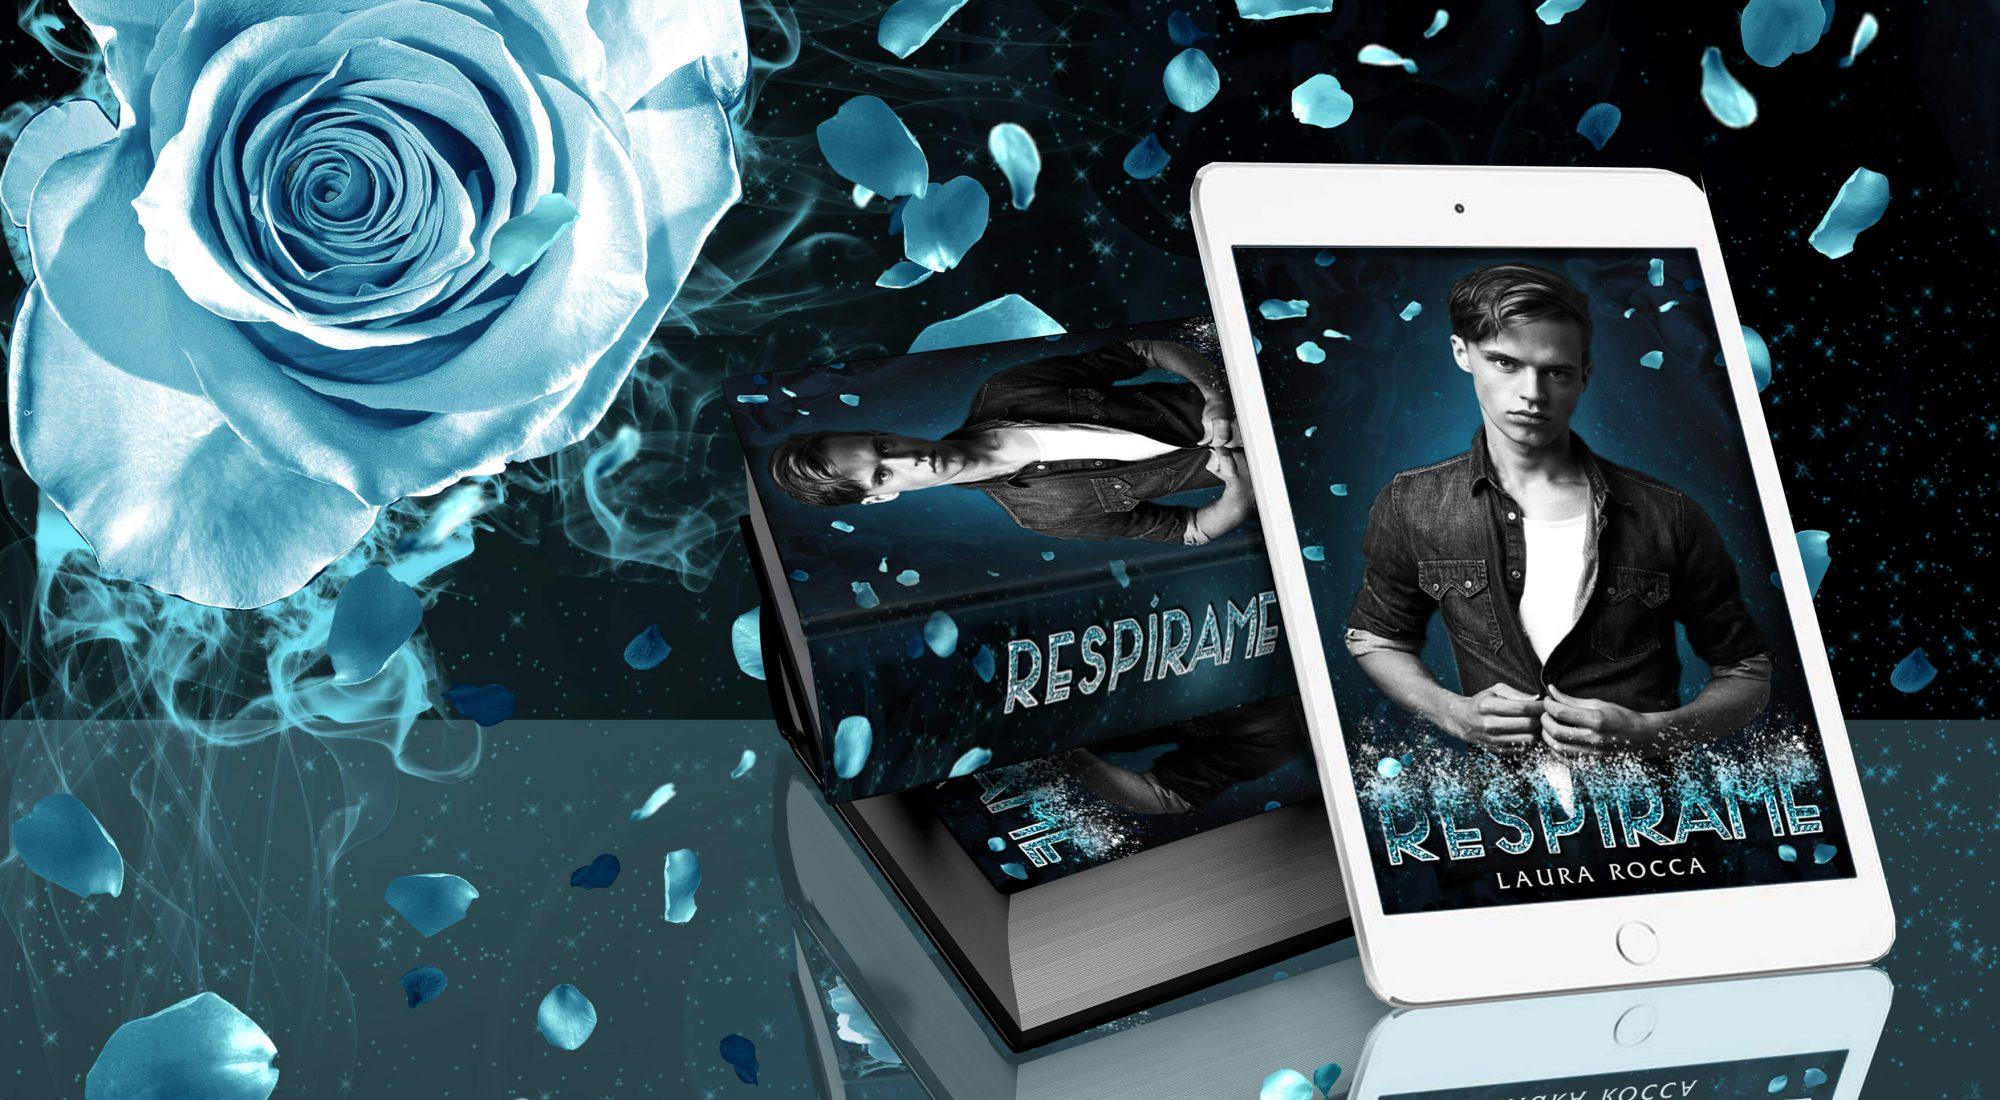 Respírame - New Adult Romance